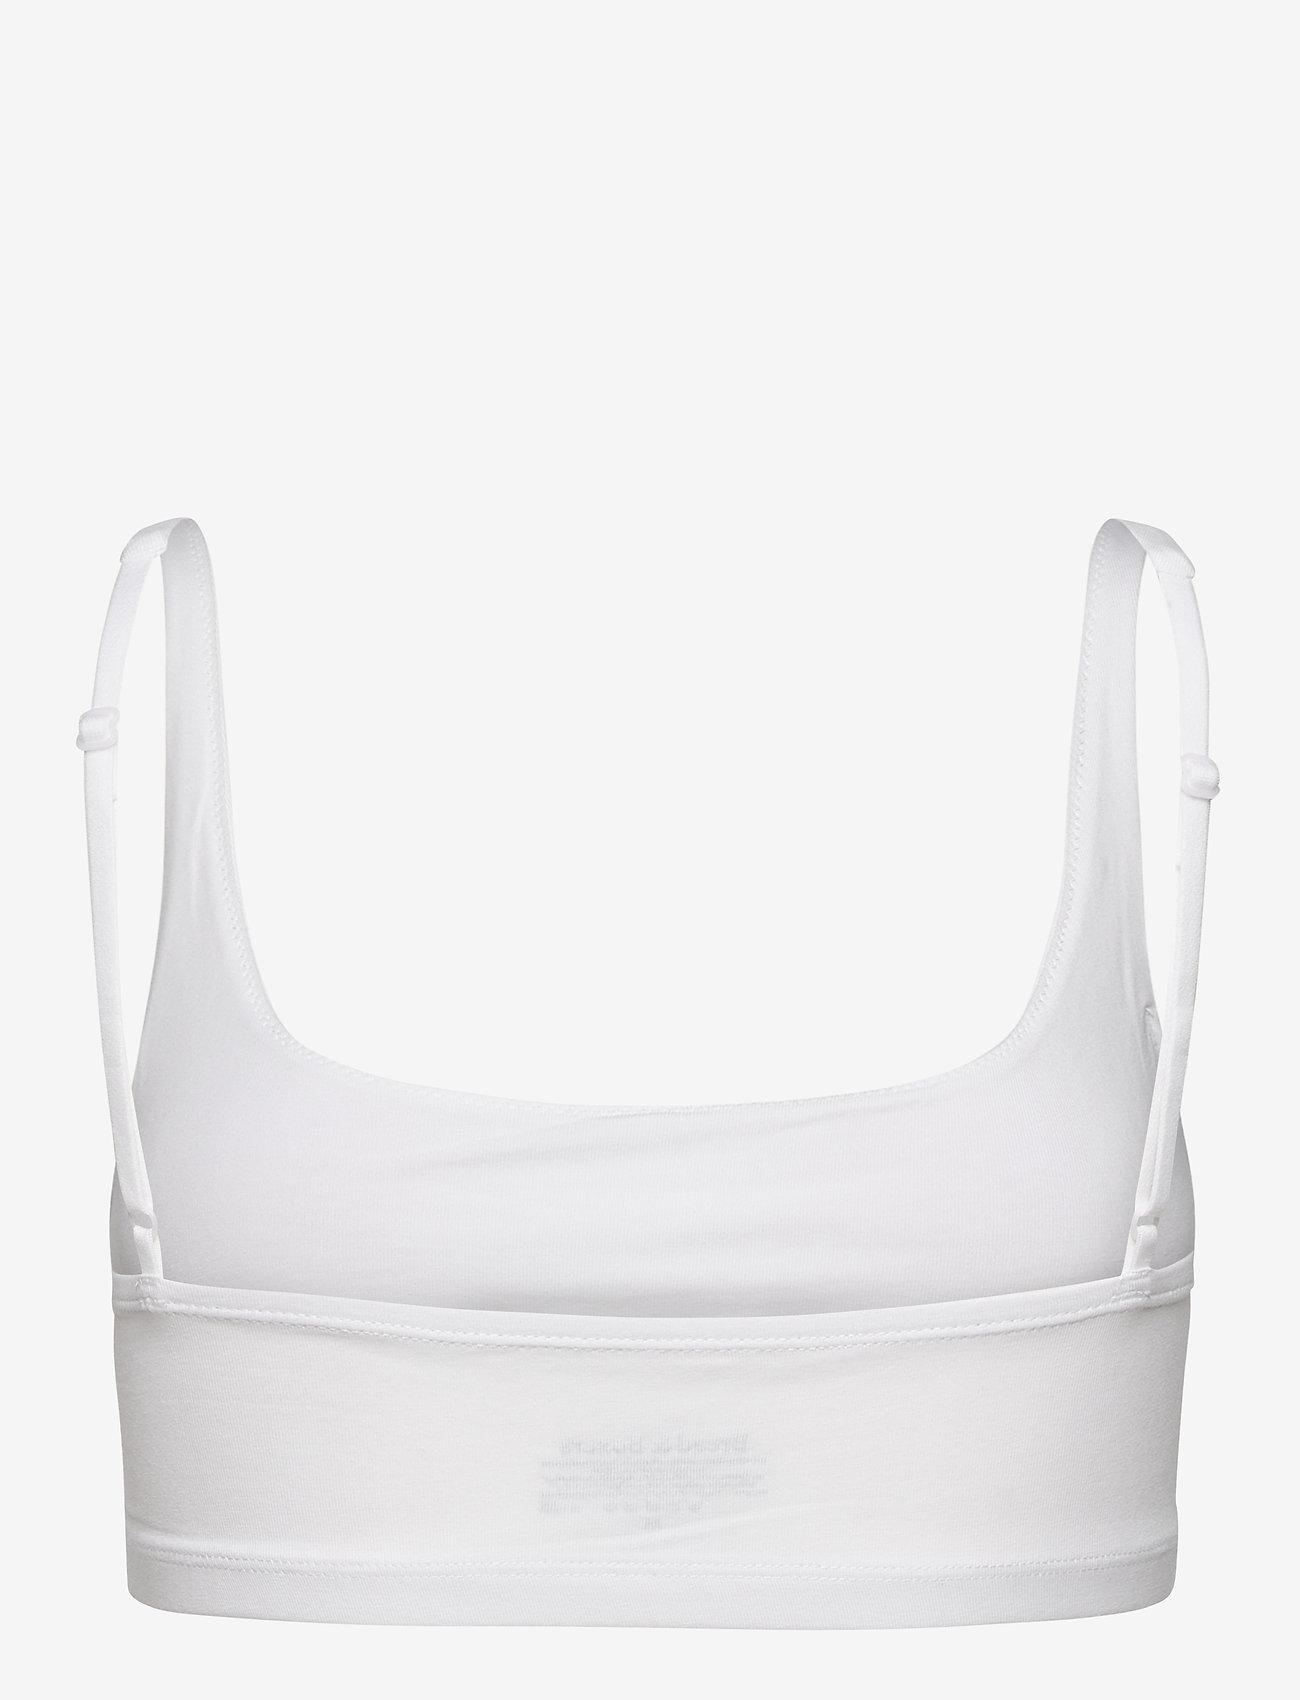 Bread & Boxers - Soft bra - soutiens-gorge souple - white - 1